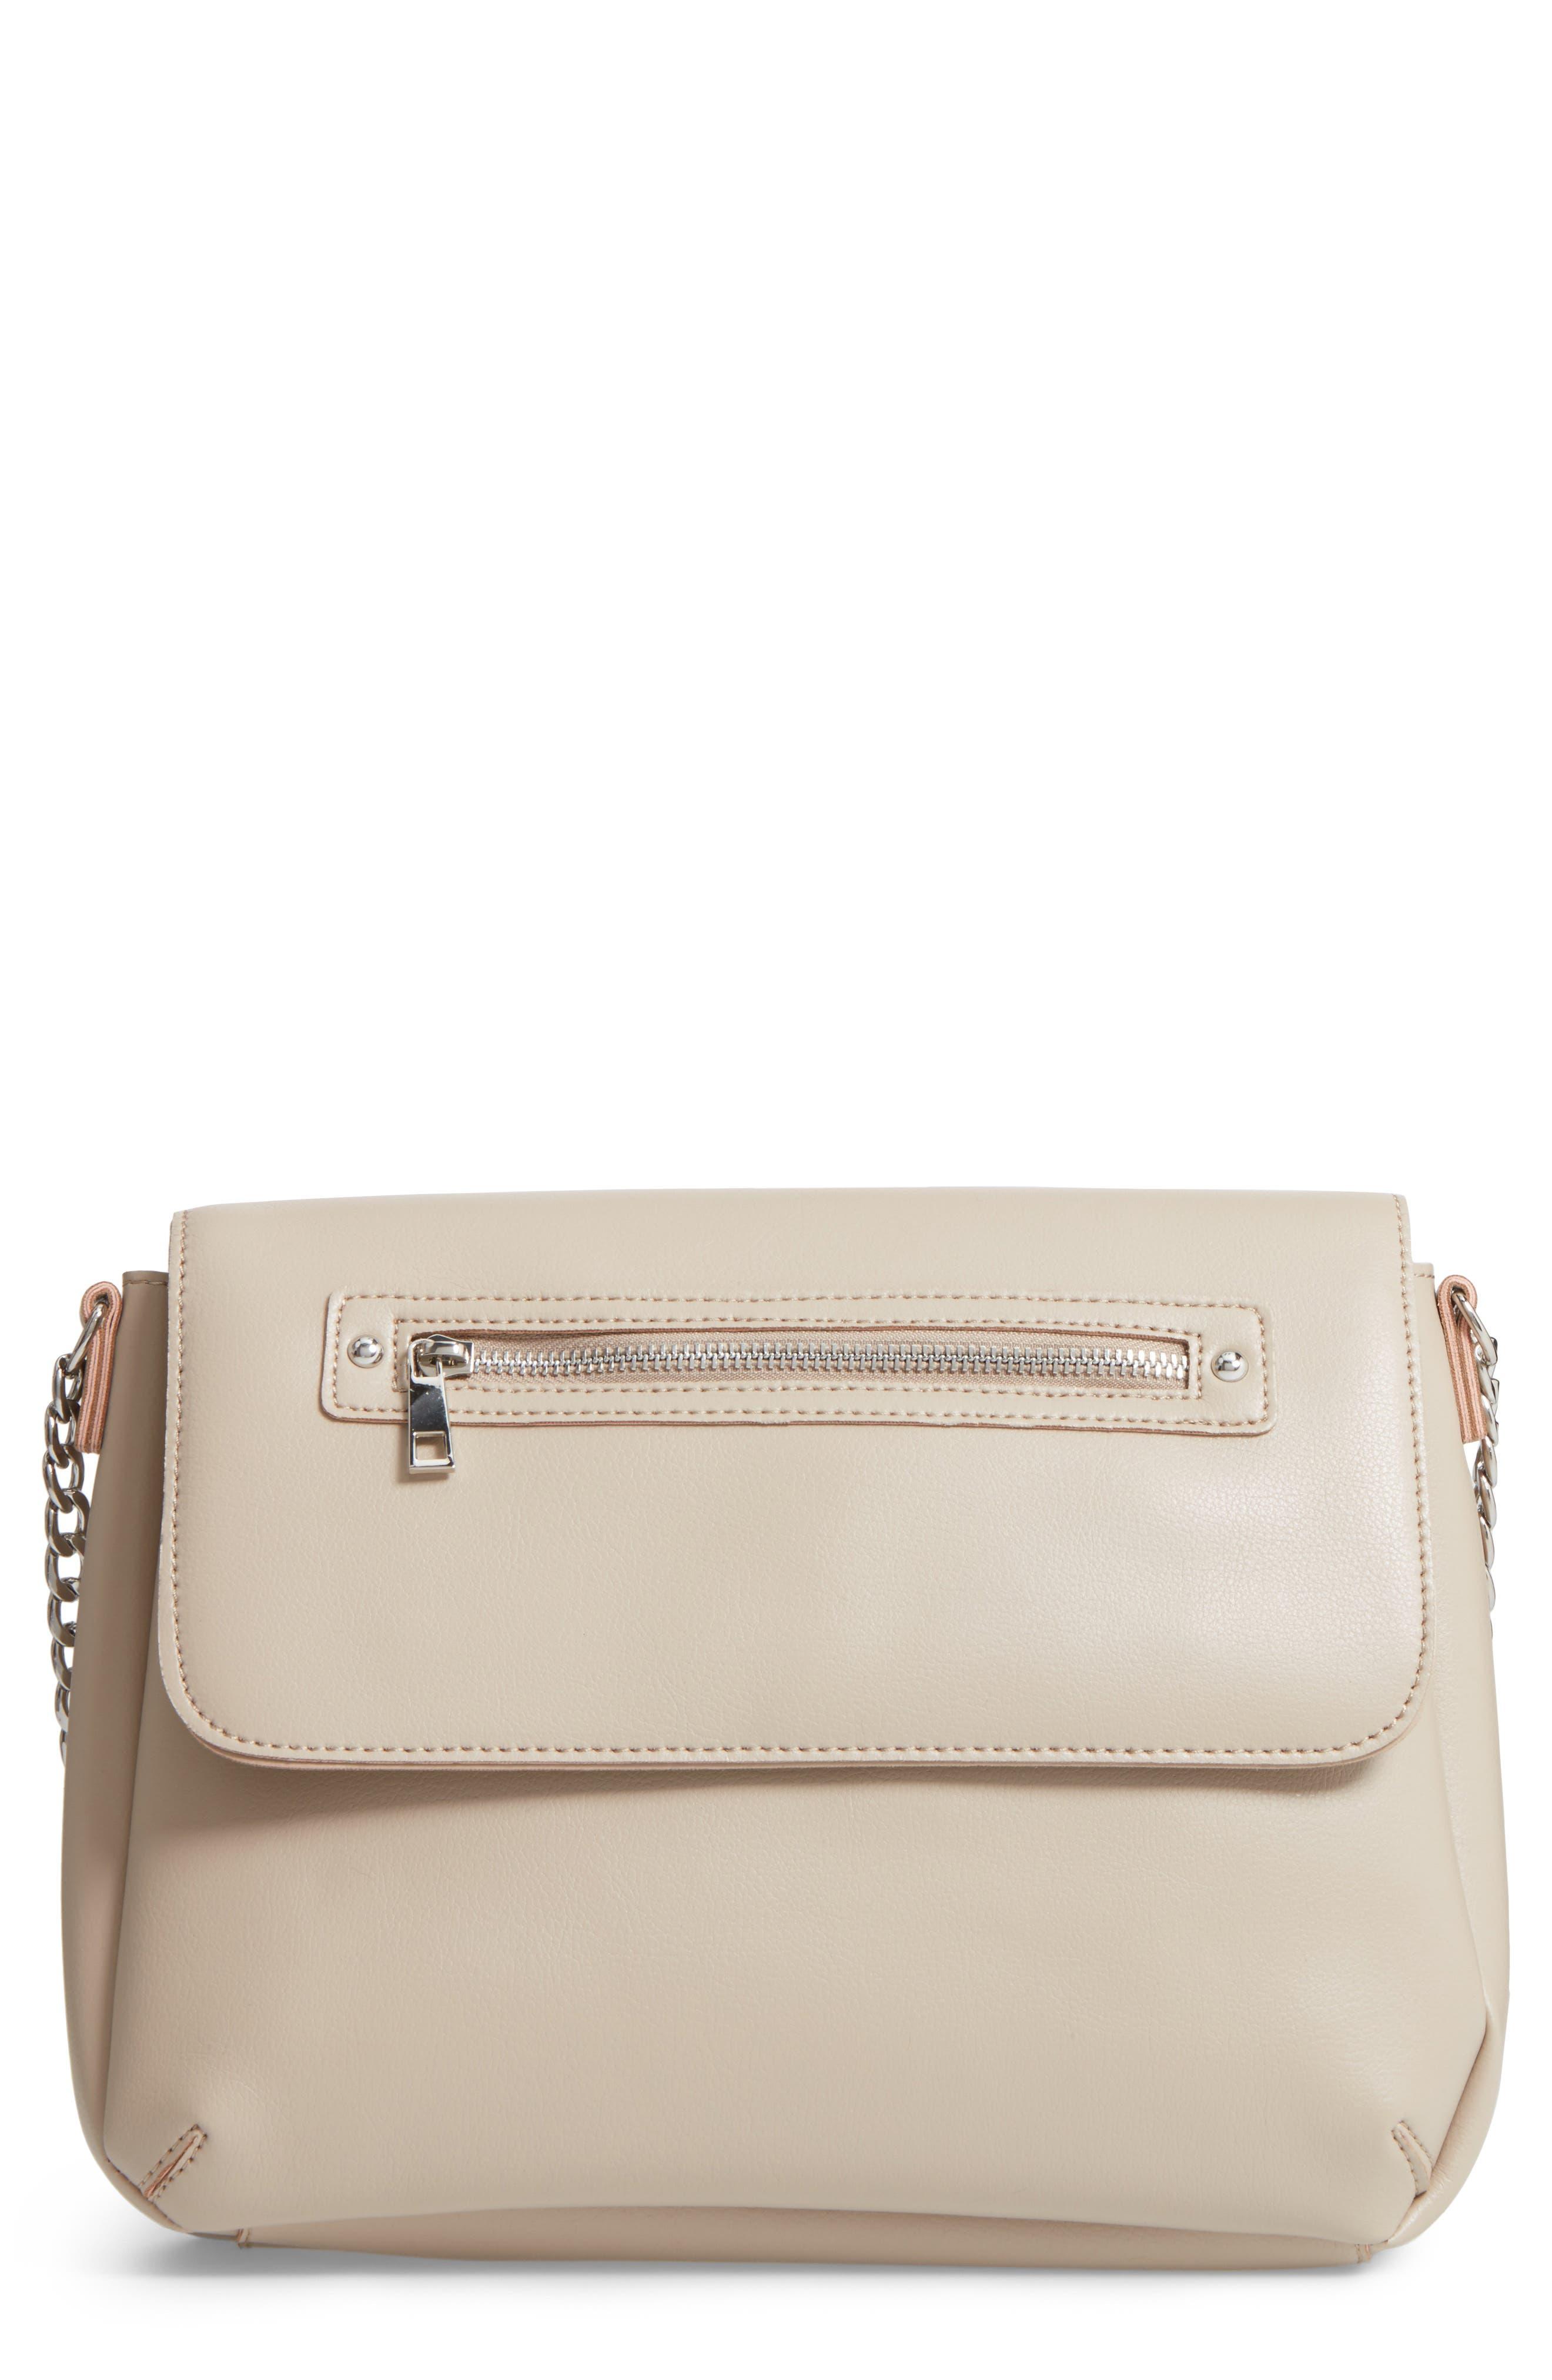 BP., Faux Leather Flap Crossbody Bag, Main thumbnail 1, color, 020